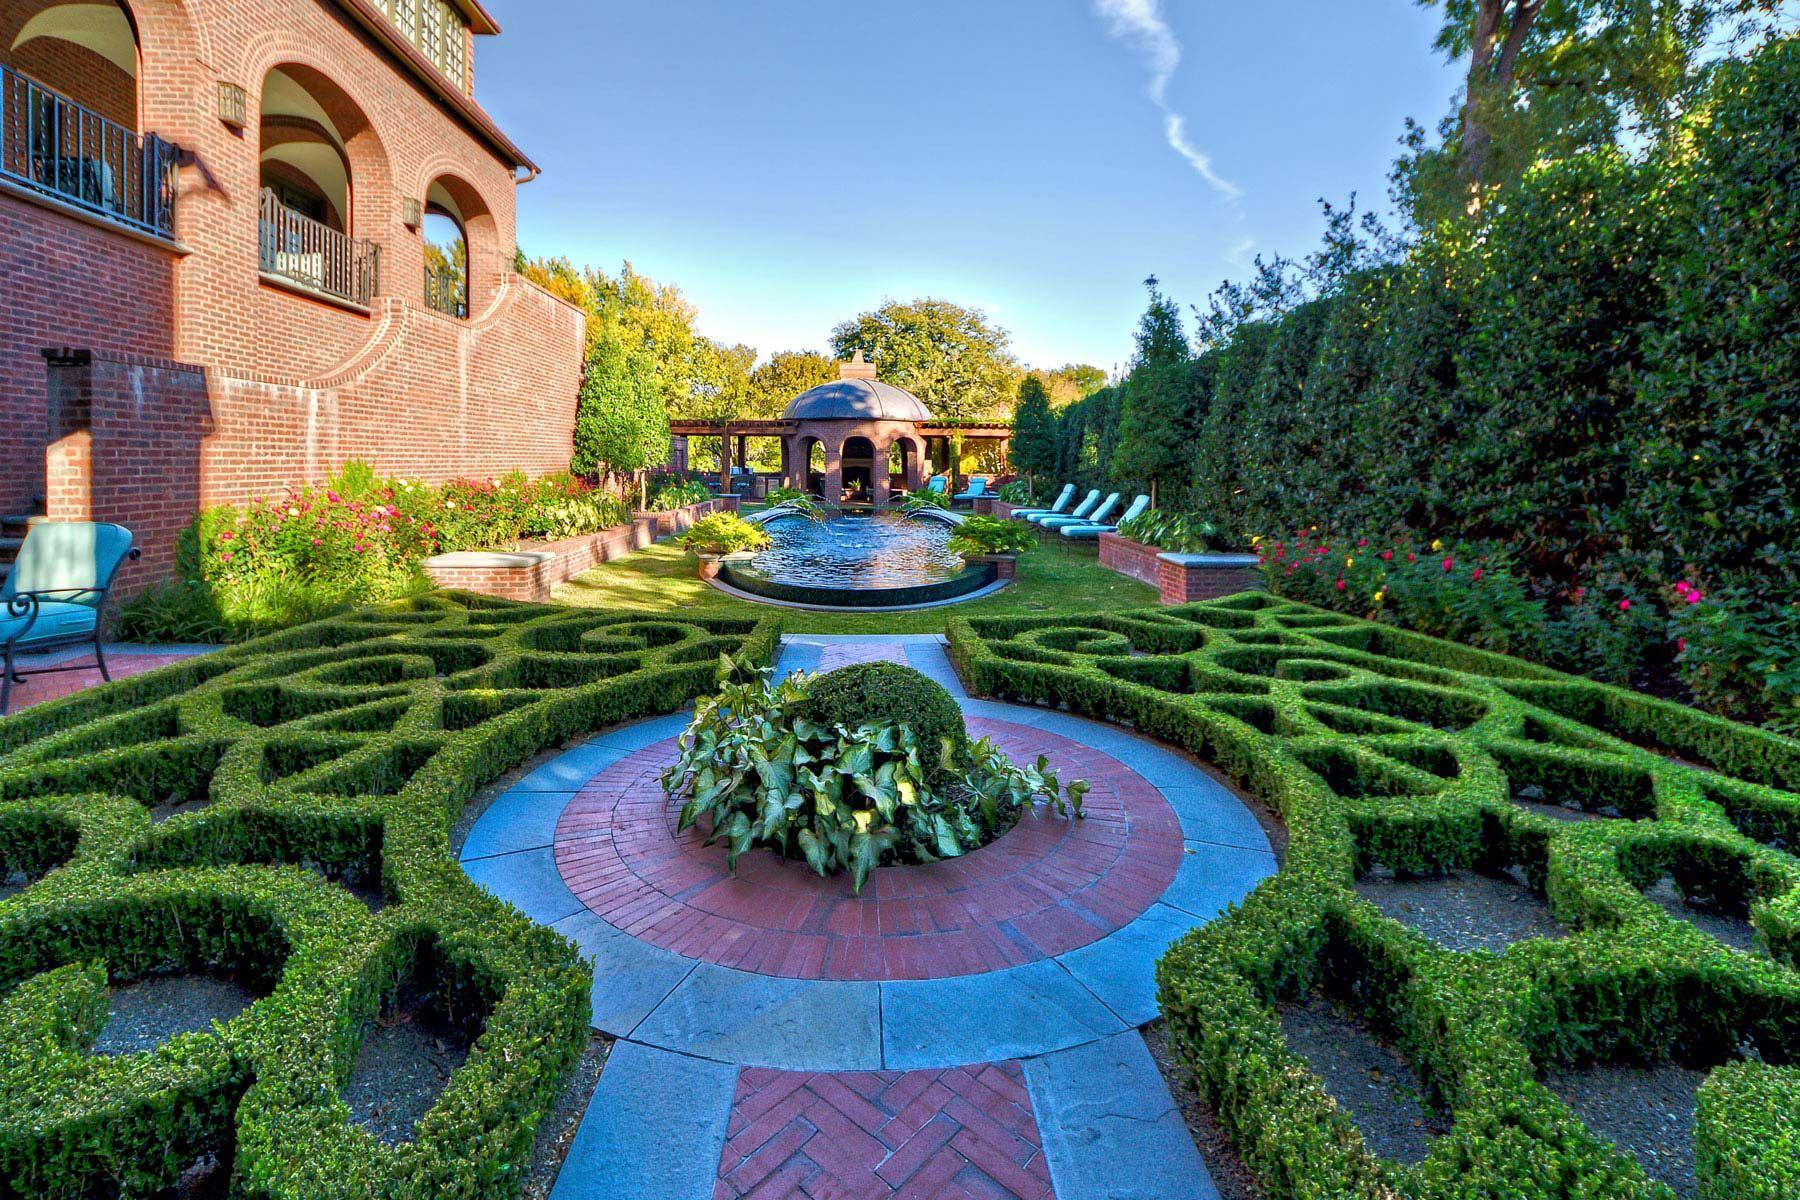 Landscape Architecture Pictures time-saver standards for landscape architecture design and